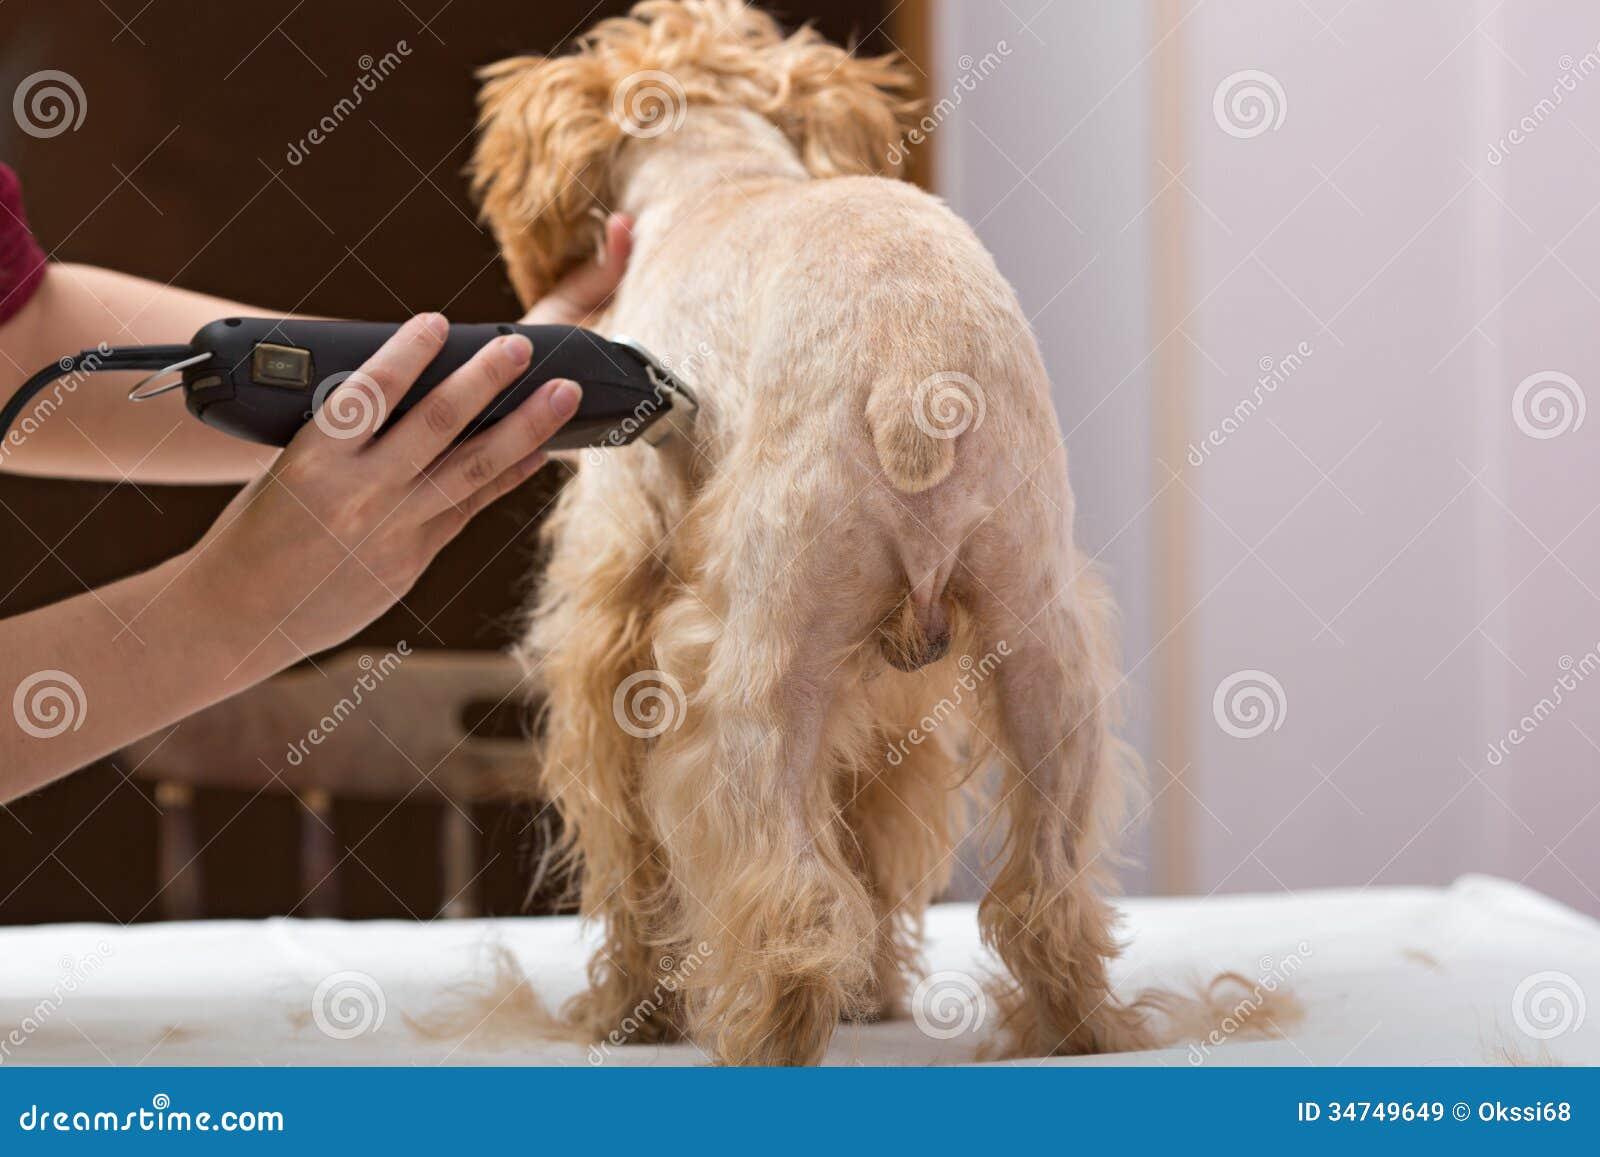 Dog Grooming Styles Haircuts